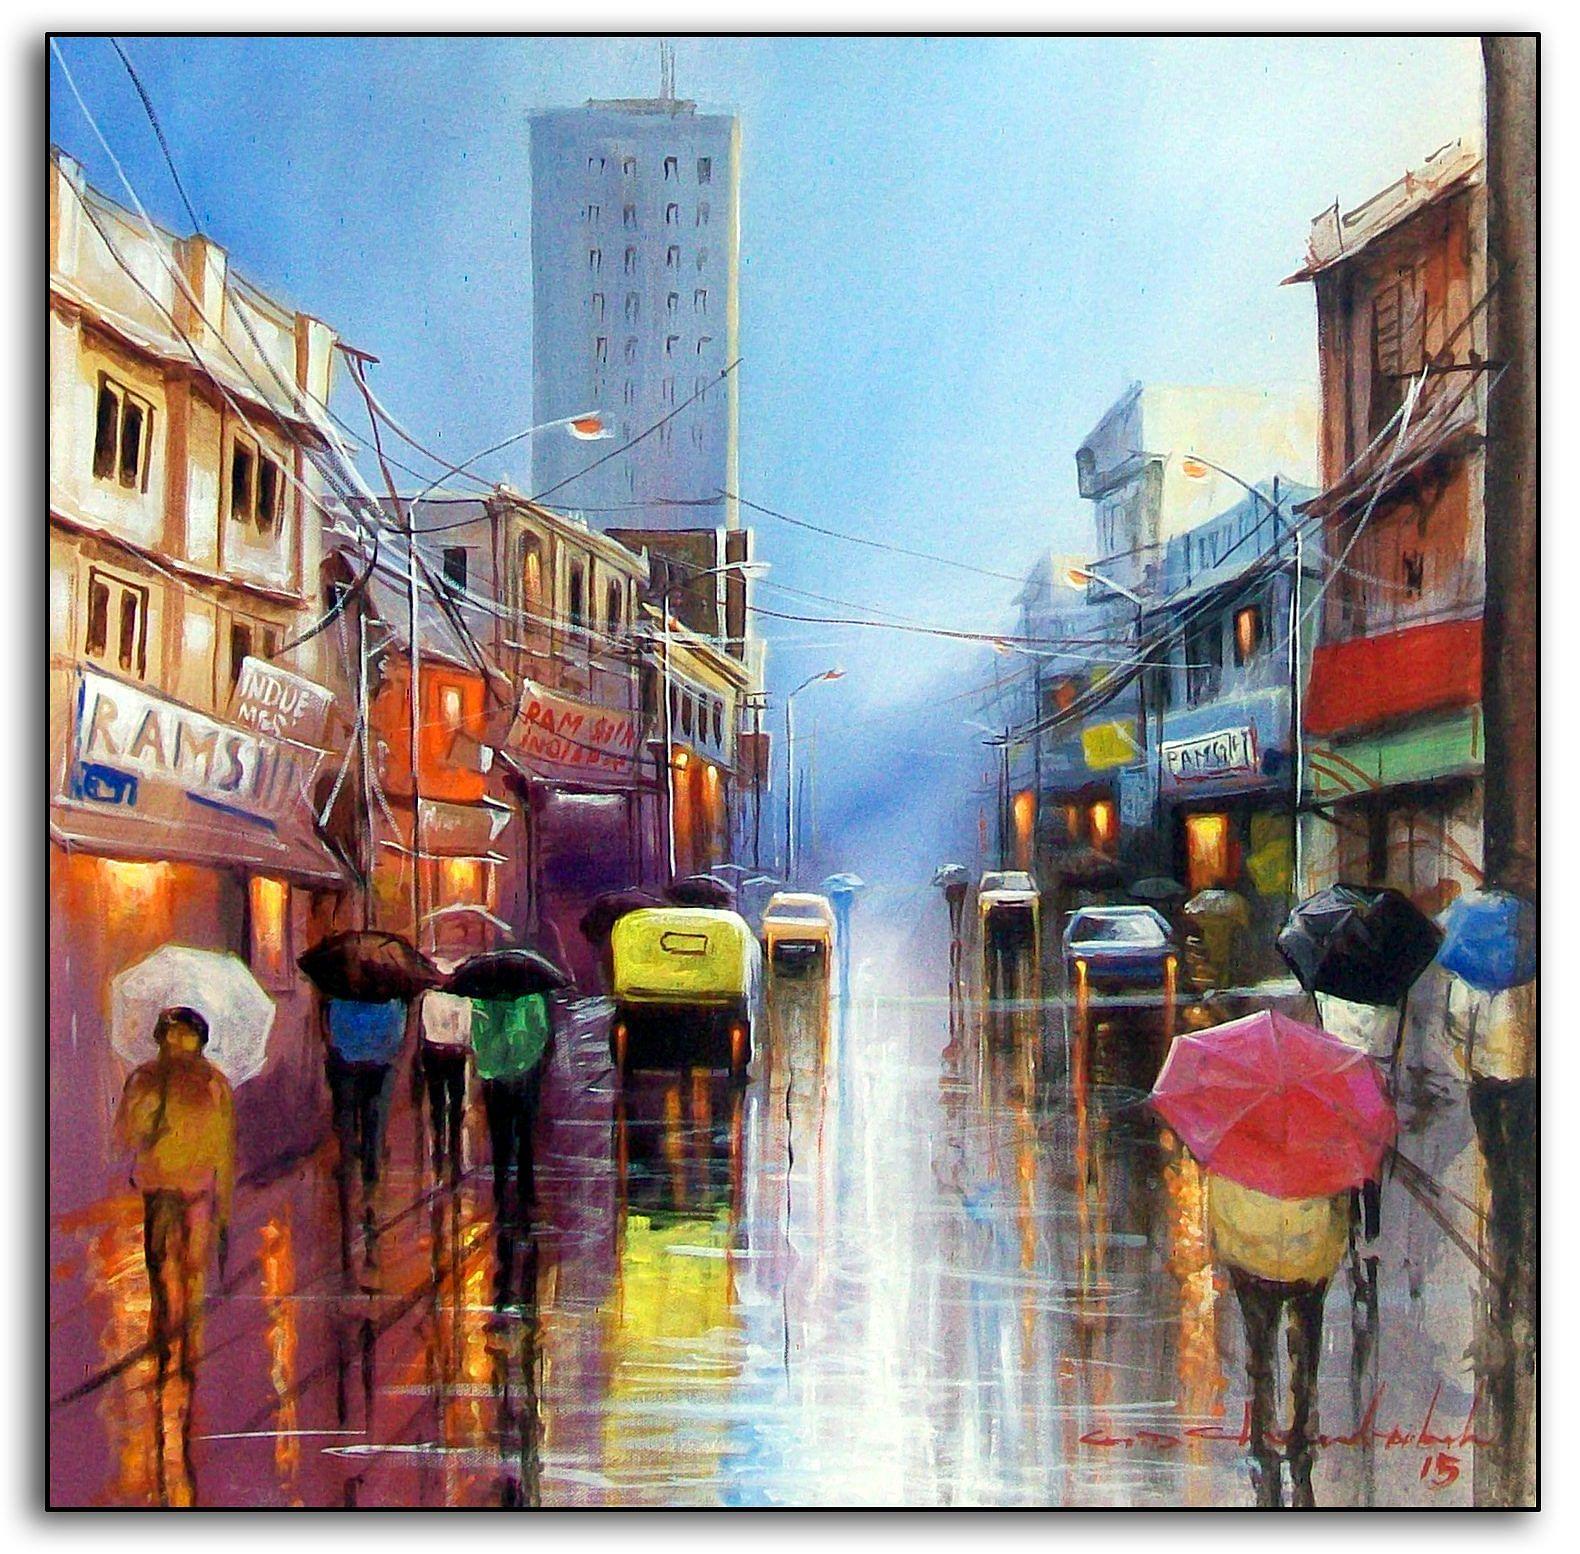 Indian Streets during monsoon. Chandrababu4